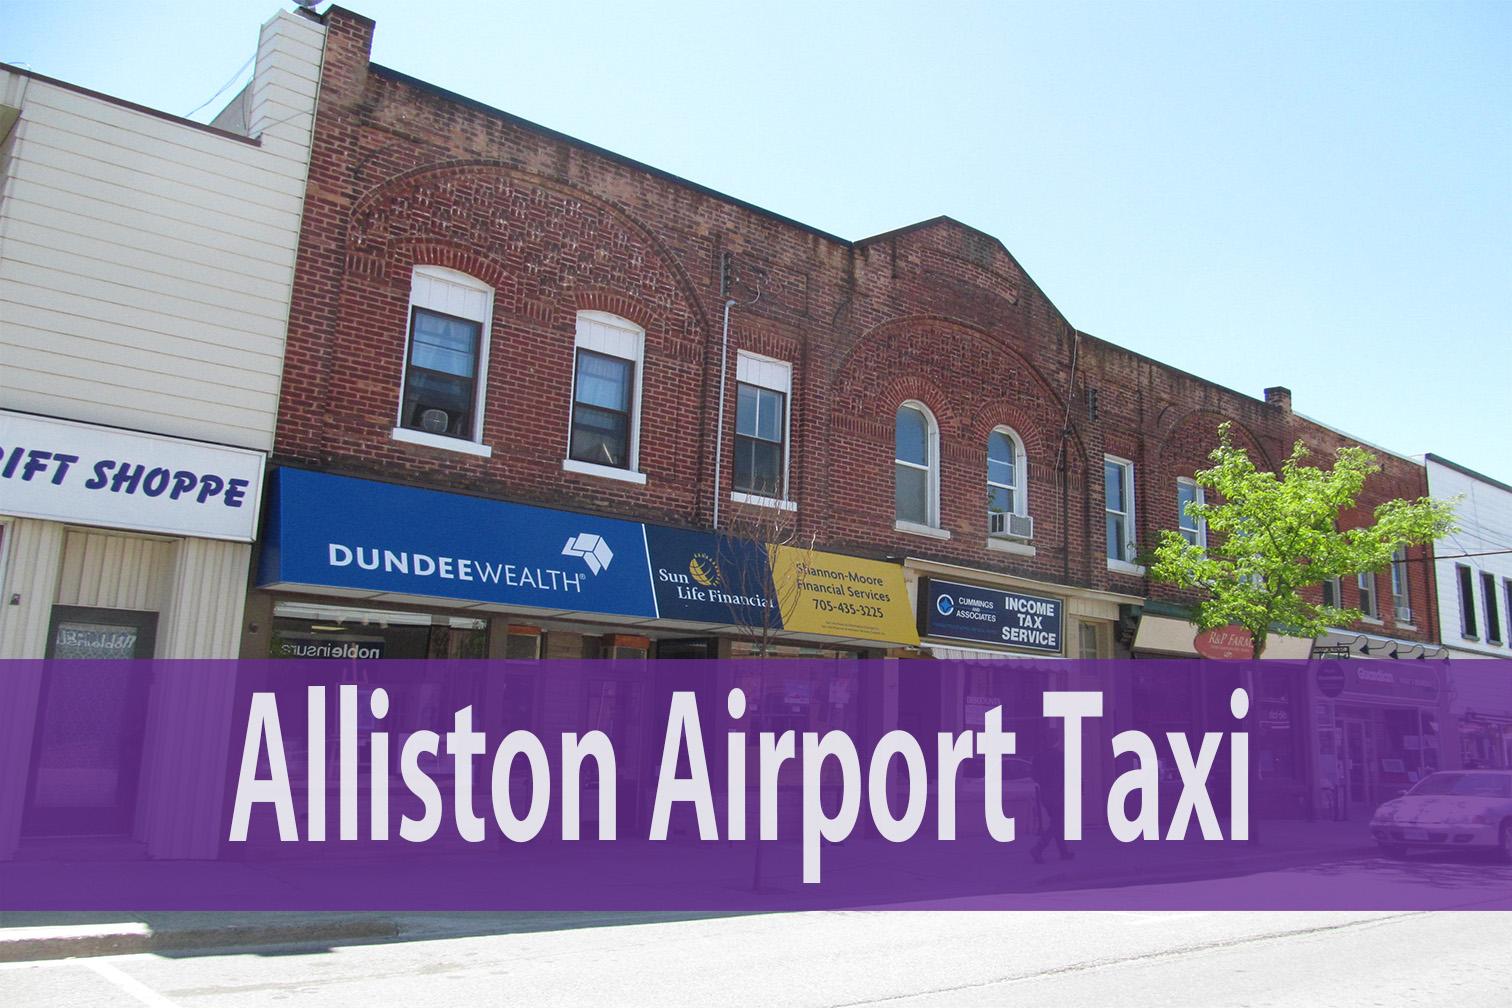 alliston airport taxi